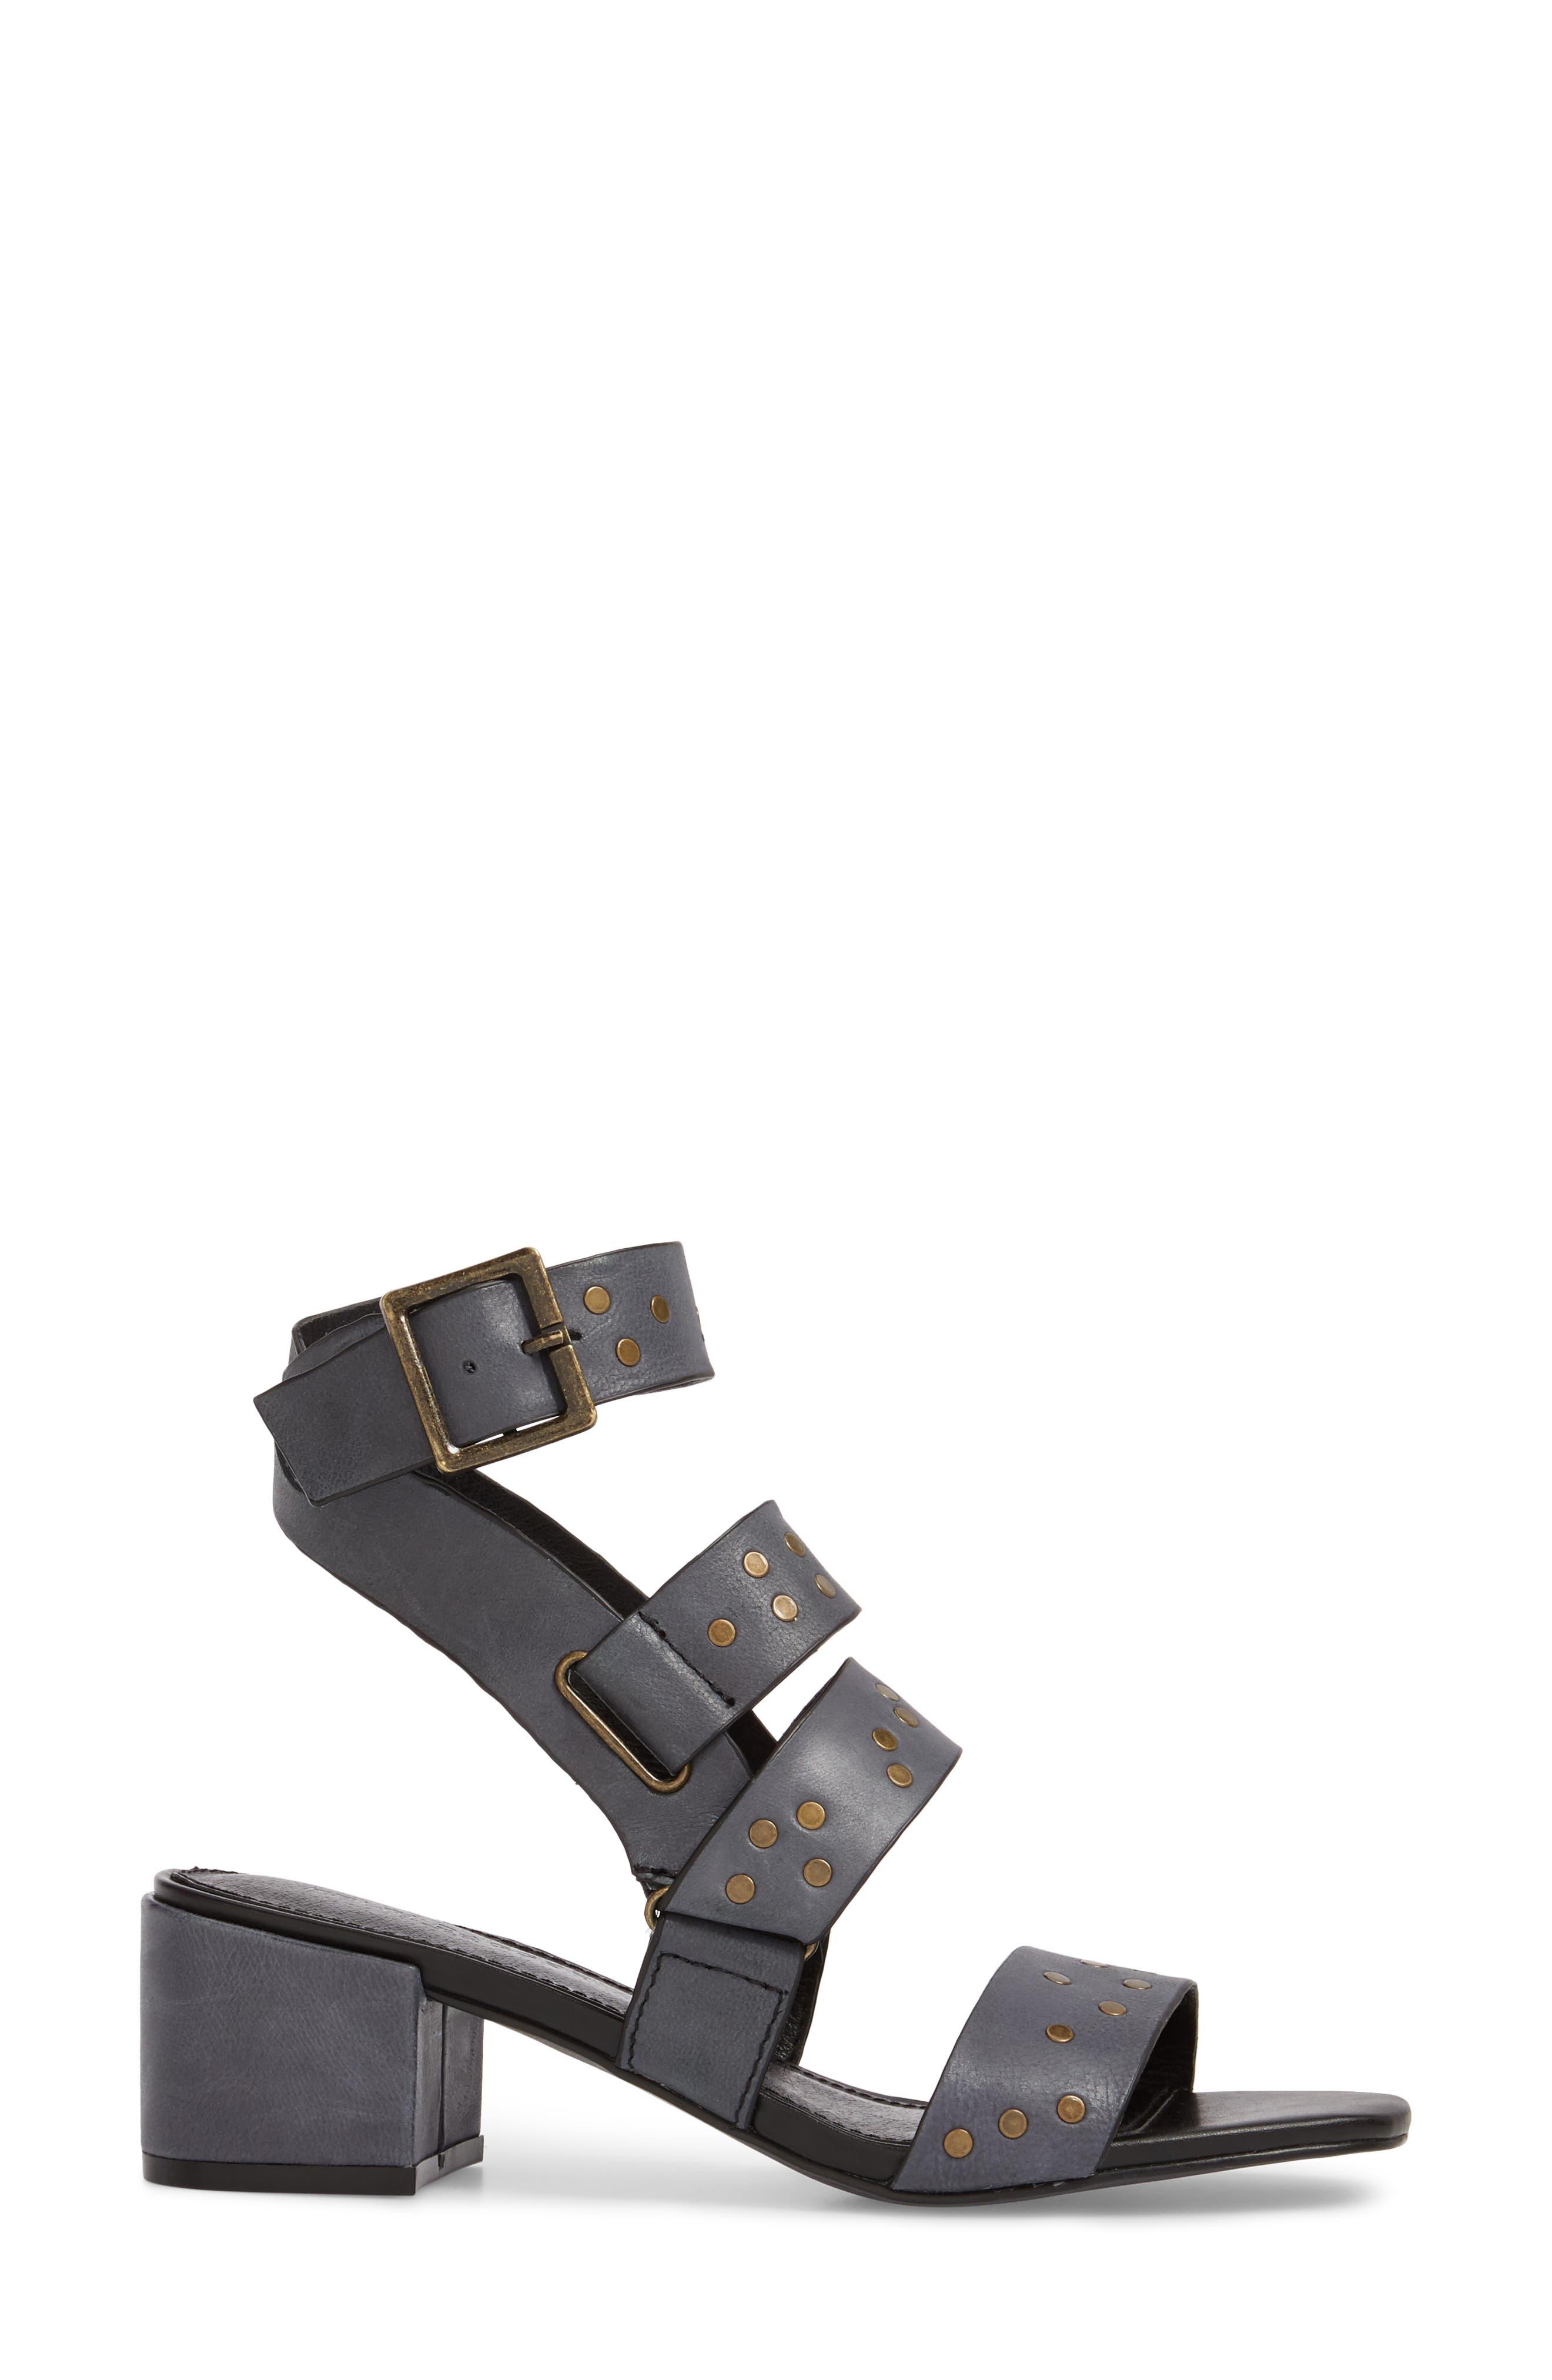 Seabring City Sandal,                             Alternate thumbnail 3, color,                             001